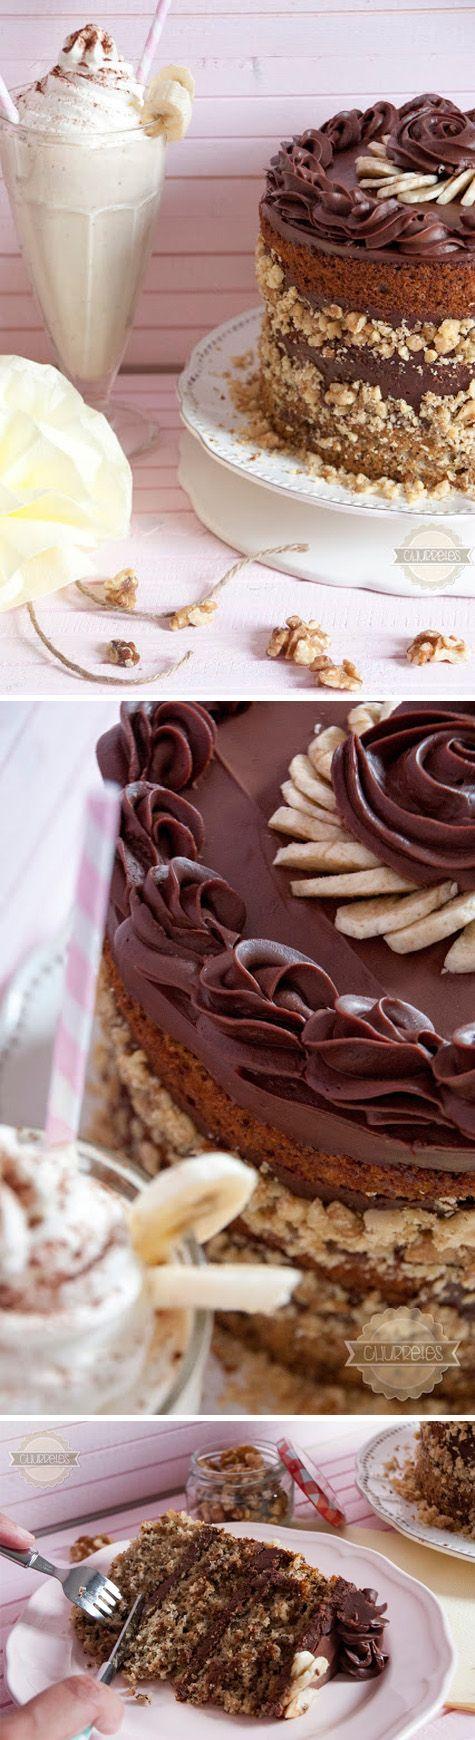 Tarta-layer-chocolate-platano-nueces-pecados-reposteria-2